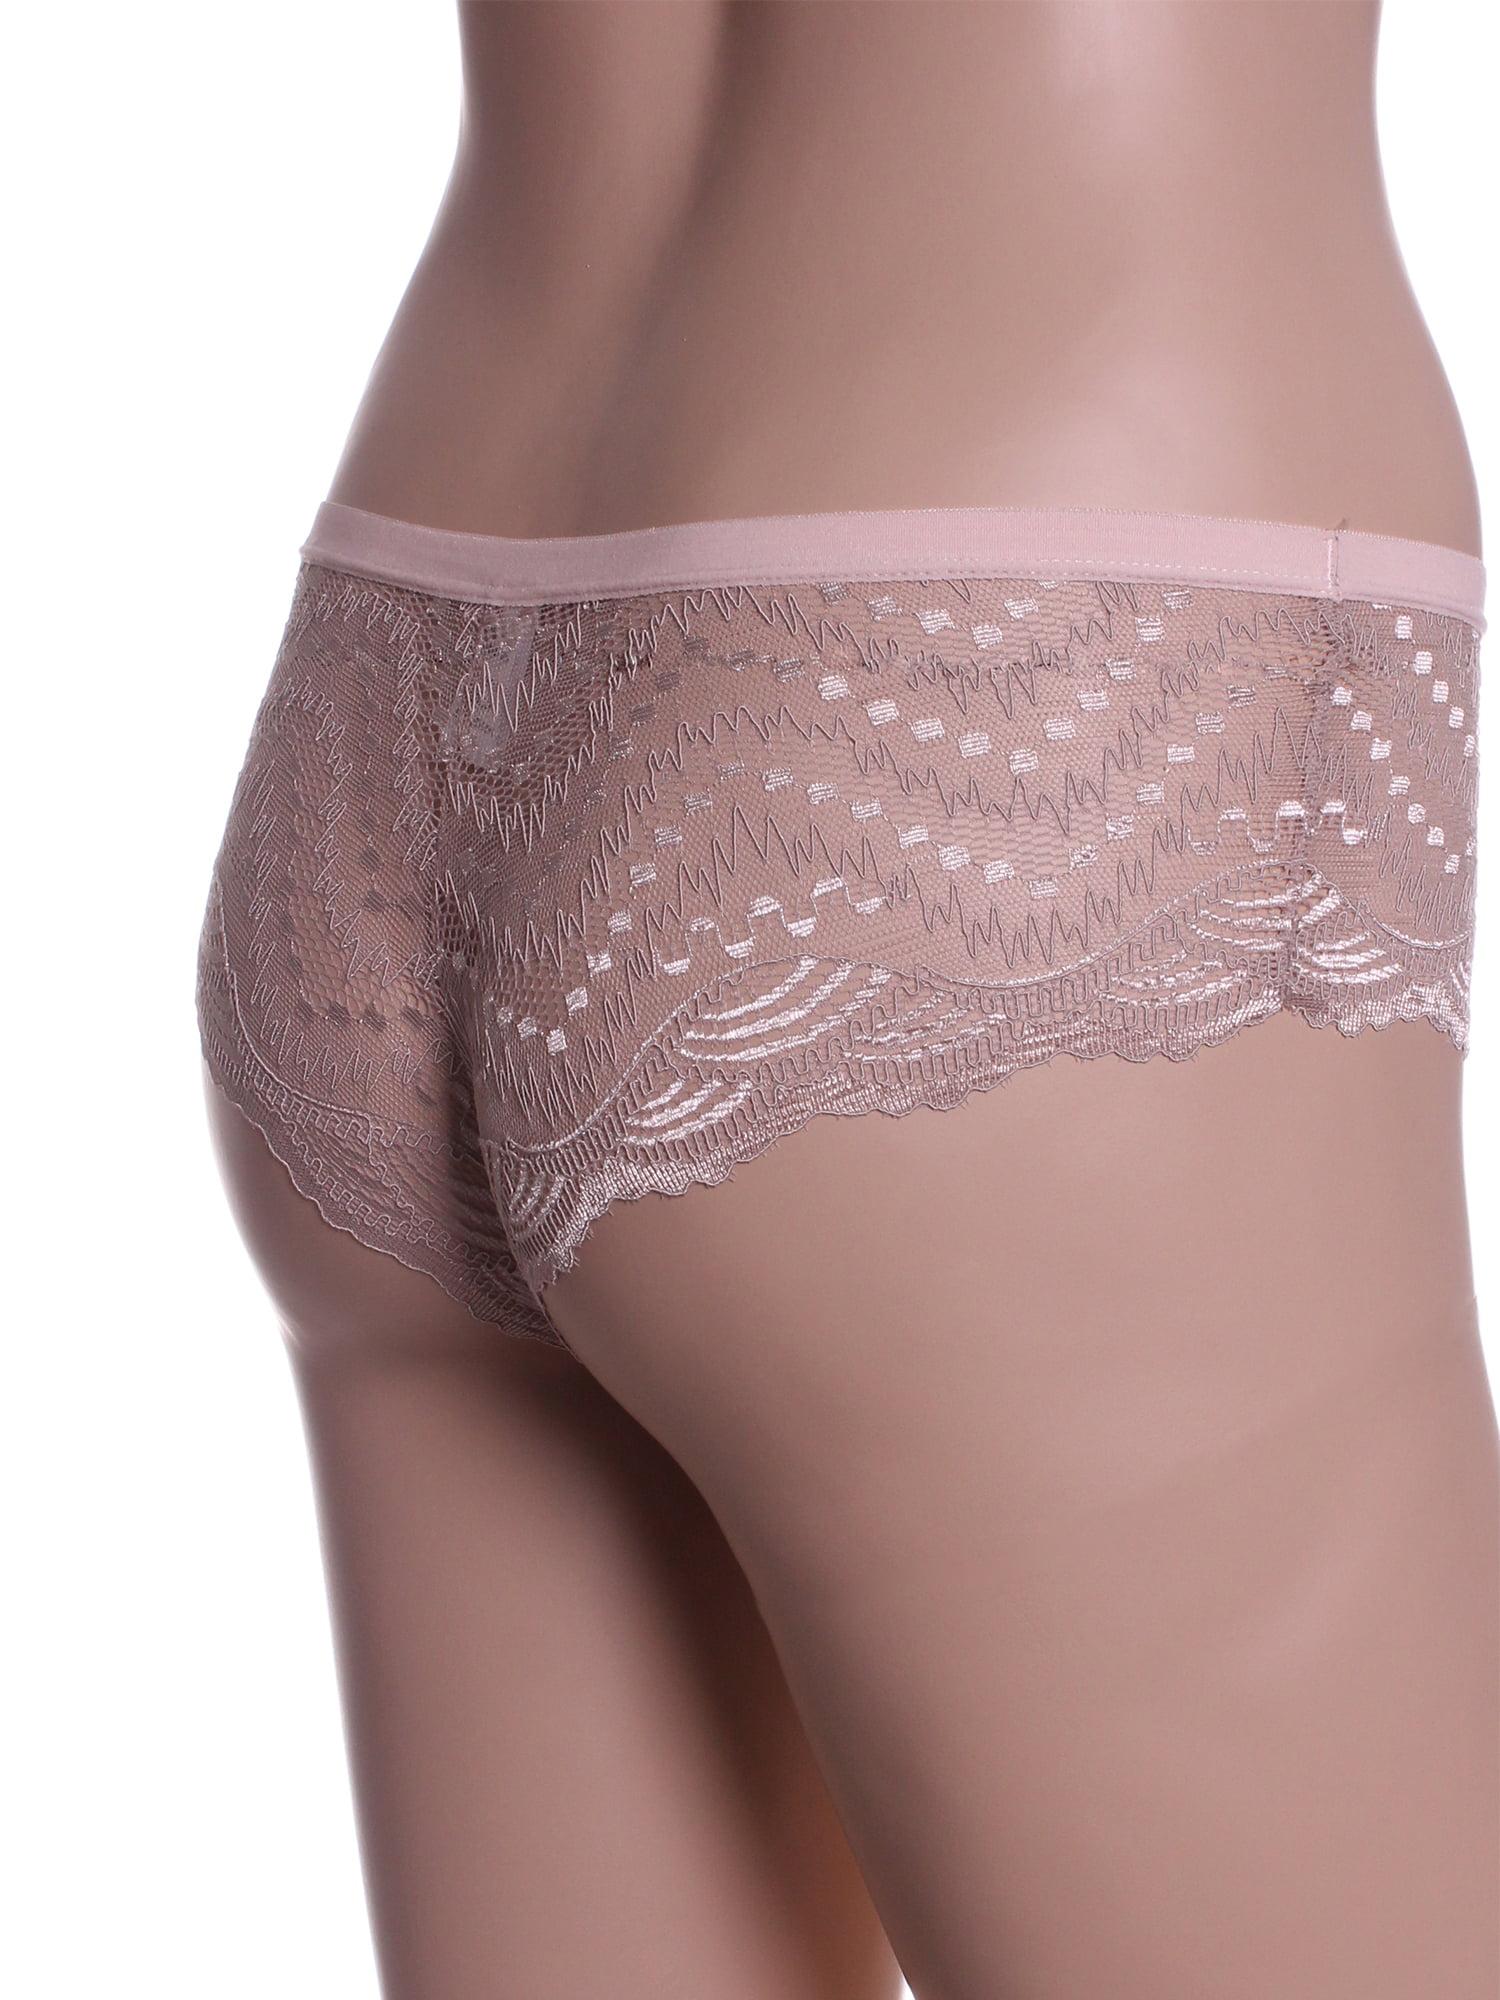 15a806e8b03 Emmalise - Emmalise Women s Sexy Lace Boy Shorts Floral Style Panty  Underwear - - Walmart.com